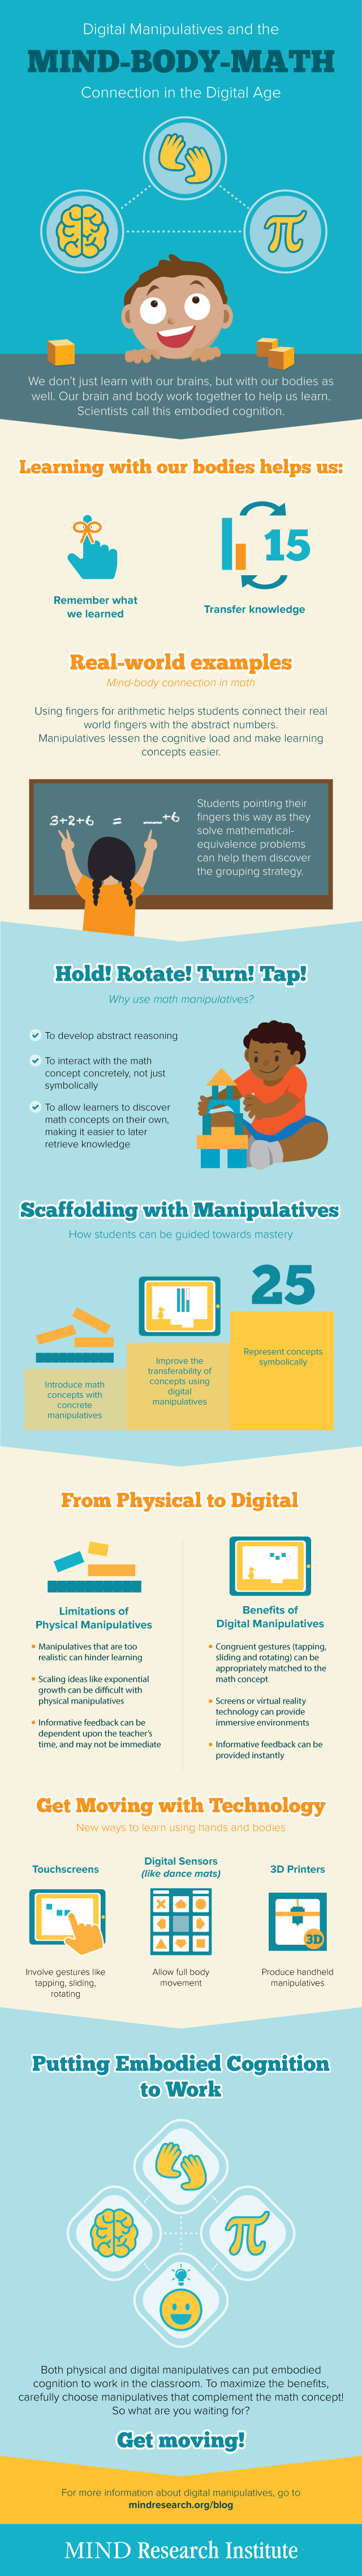 Mind-Body Math: Manipulatives in the Digital Age